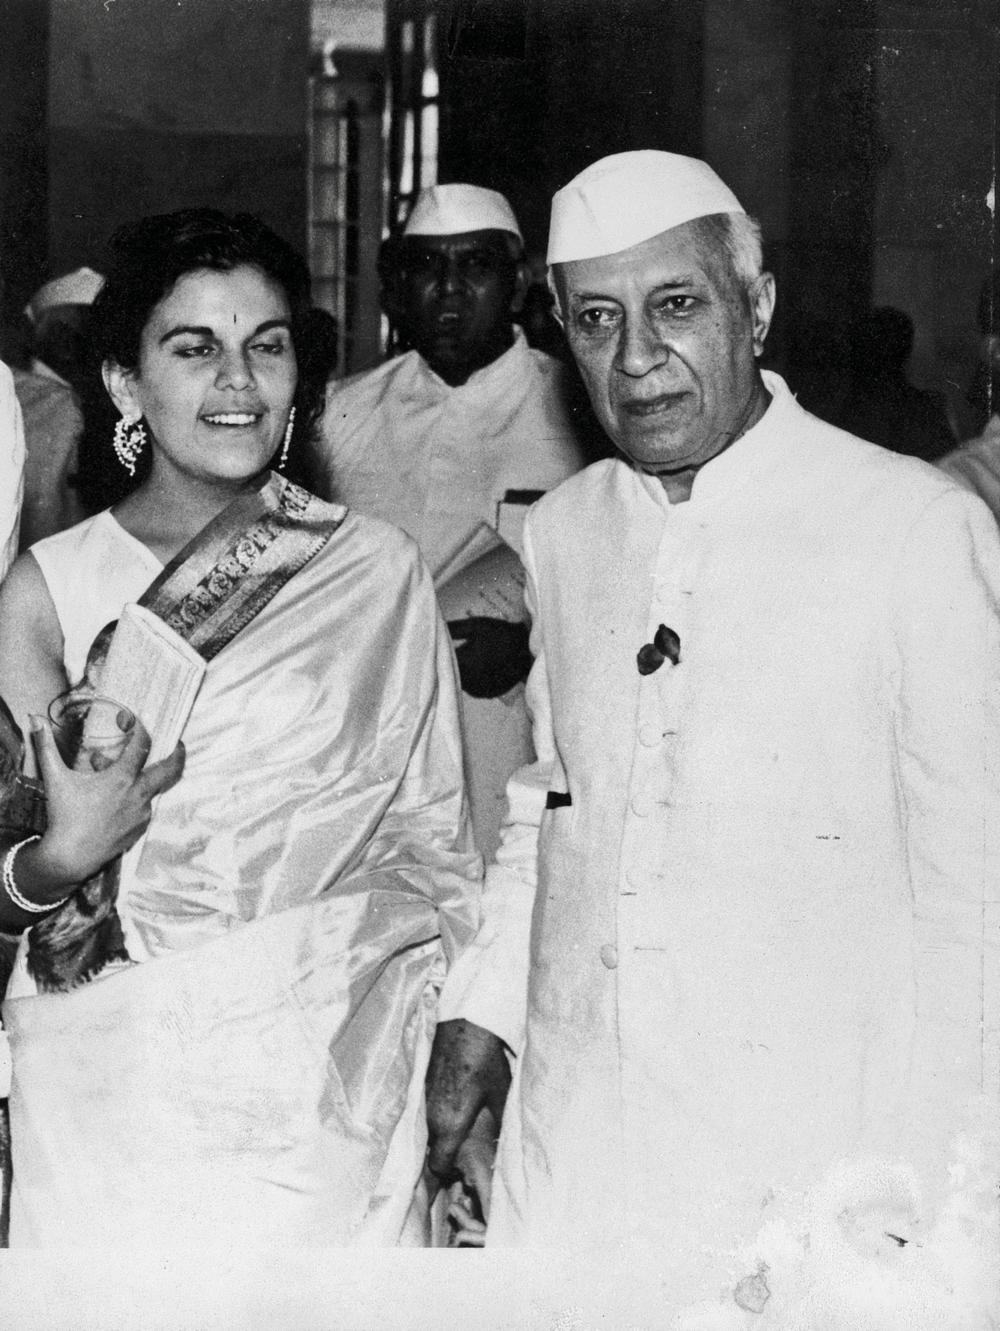 Sudha and Nehru at the Padma award ceremony, c. 1962